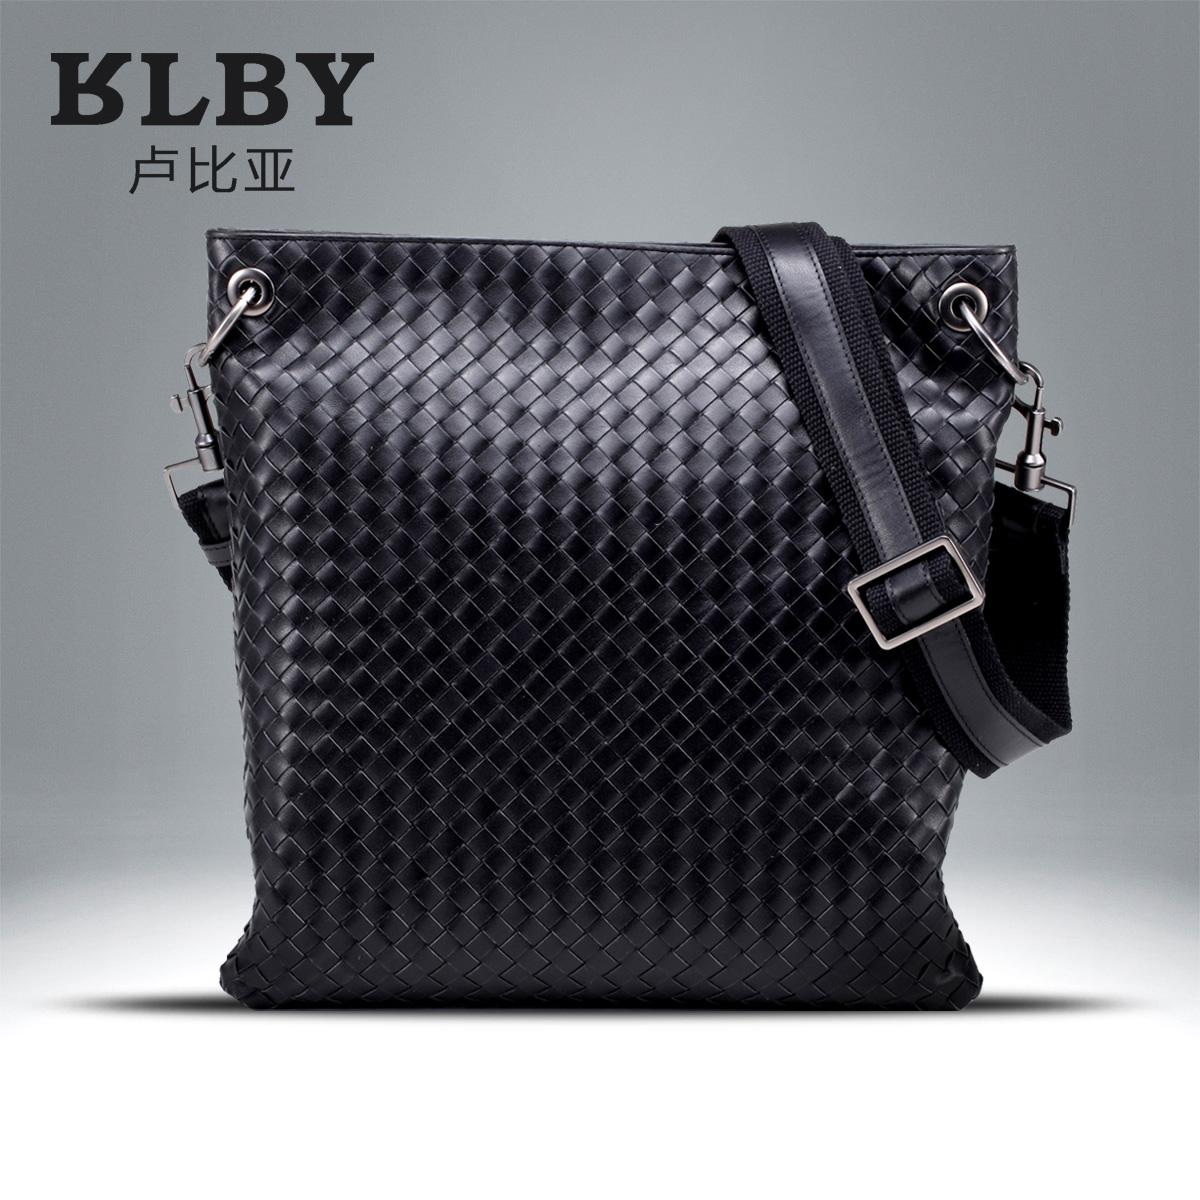 Rubbia woven shoulder bag leather man bag Messenger bag vertical section mens business casual calf leather satchel bag<br><br>Aliexpress